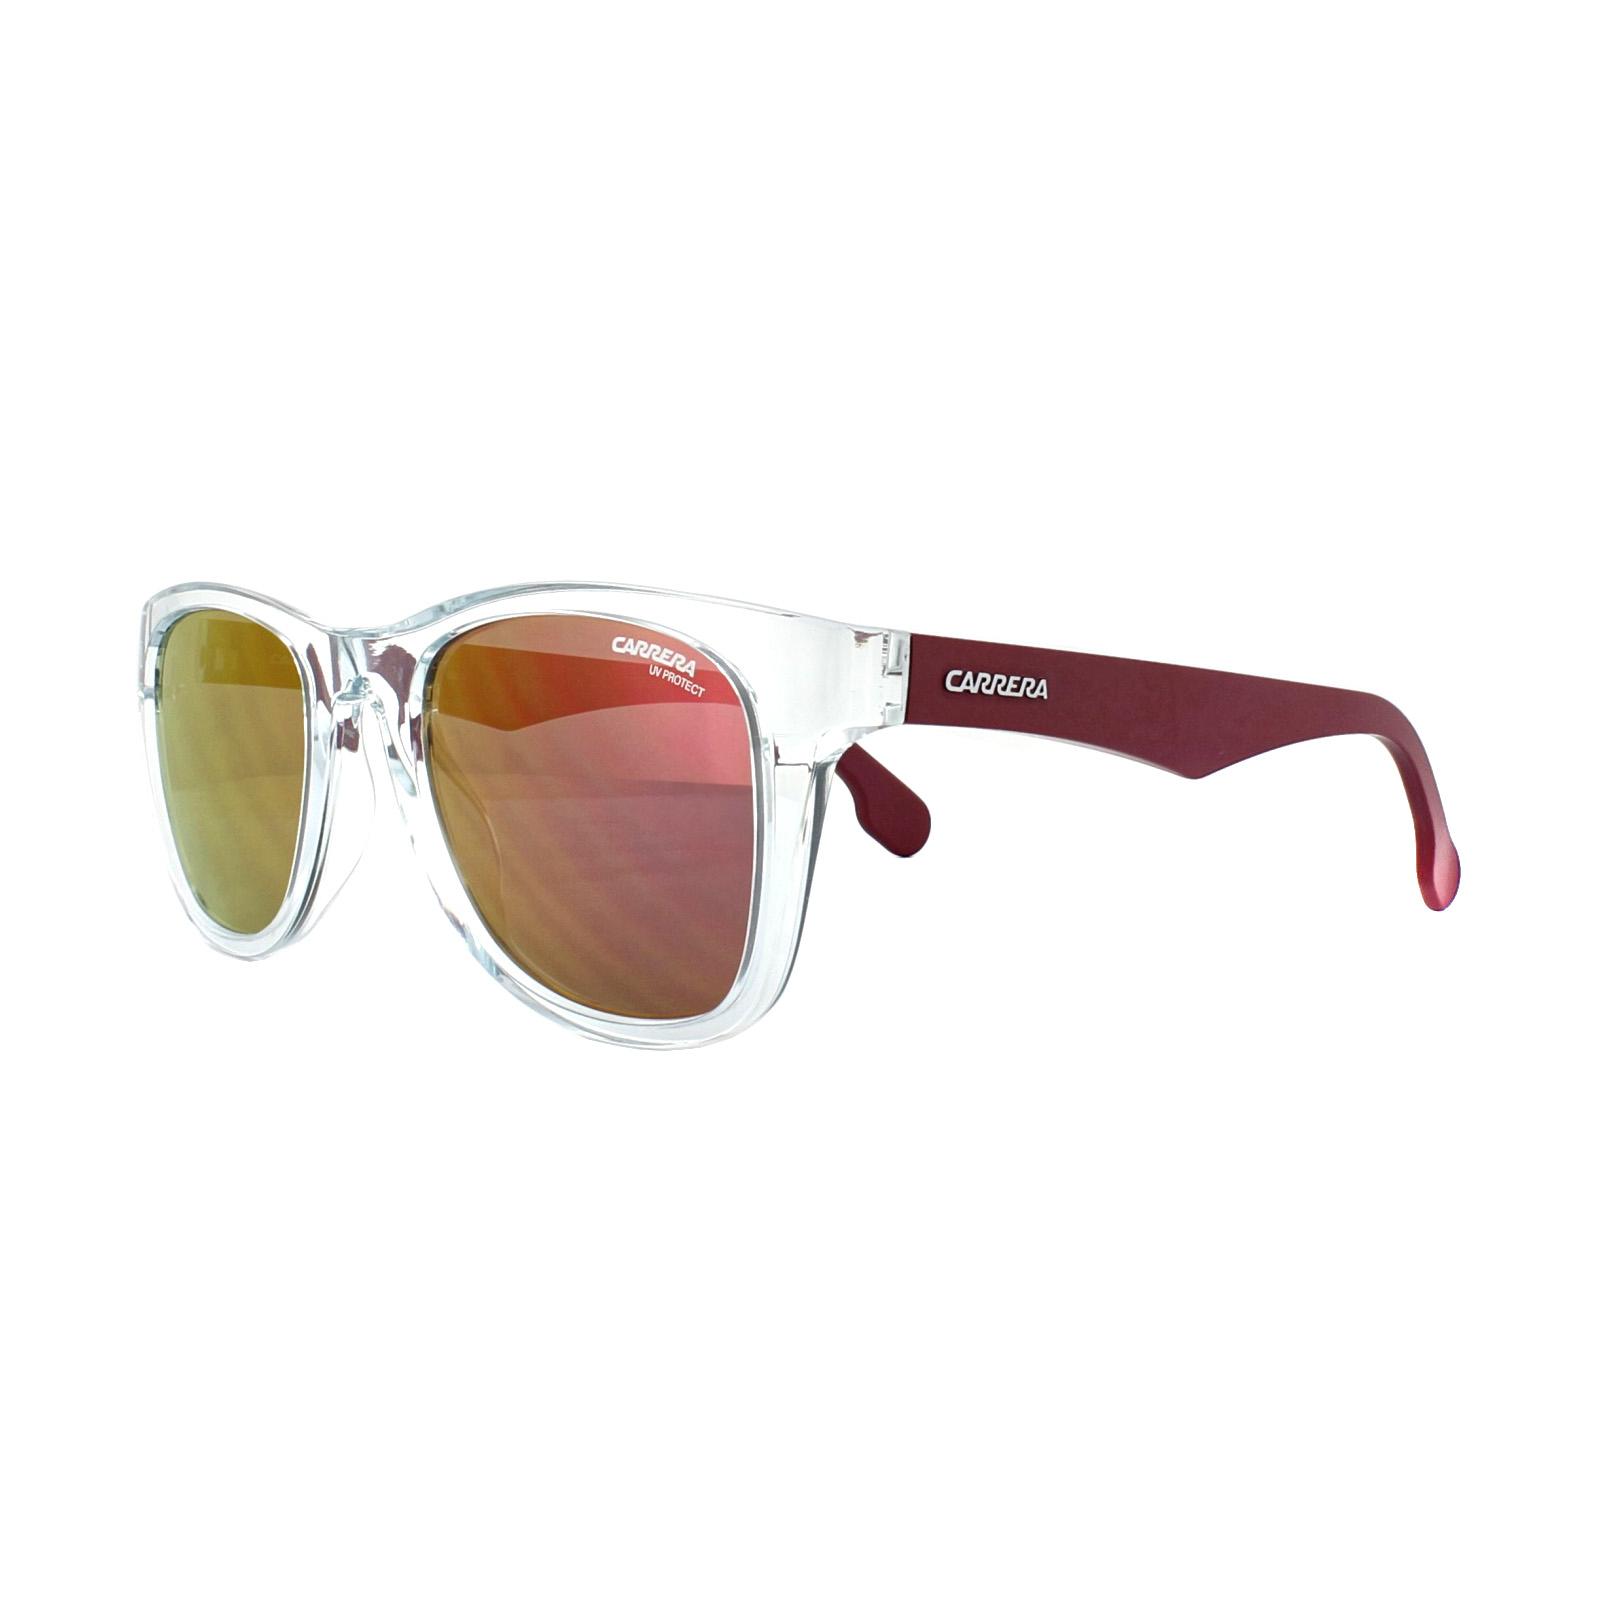 Carrera Eyewear Sonnenbrille » CARRERA 5038/S«, lila, 4QI/VQ - lila/rosa